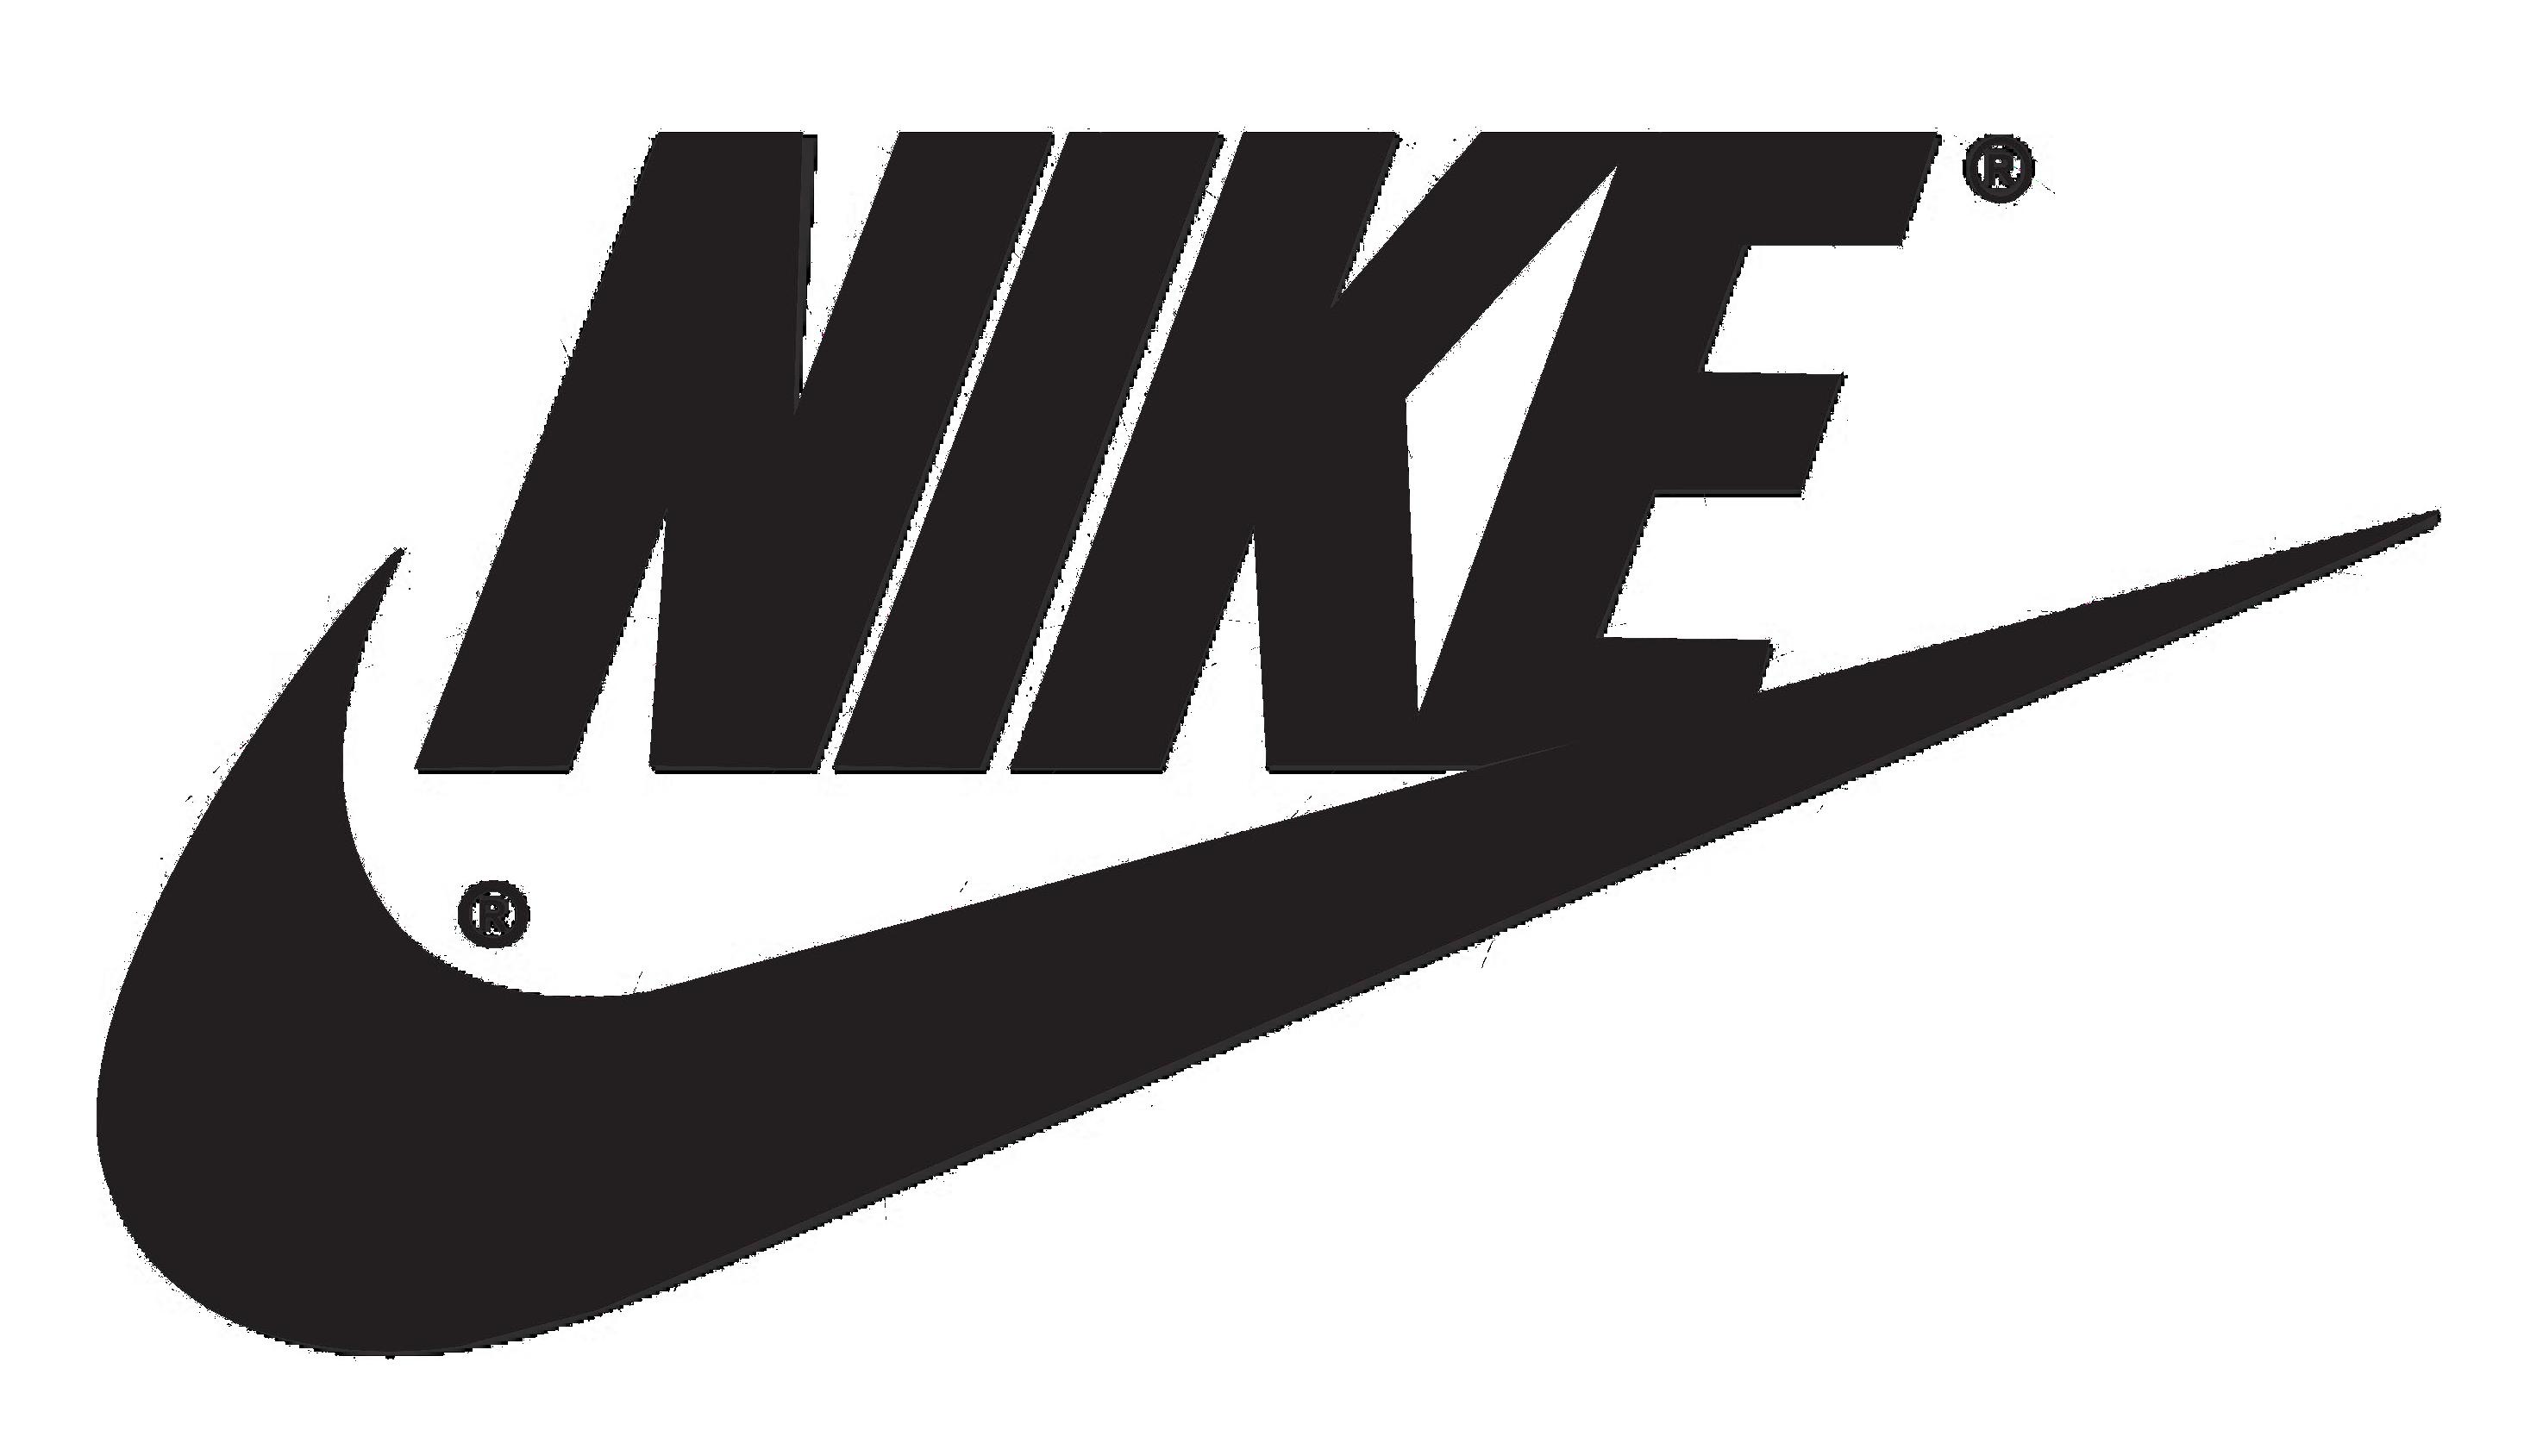 Glasglow airport Fashion logo, Nike logo, Fashion